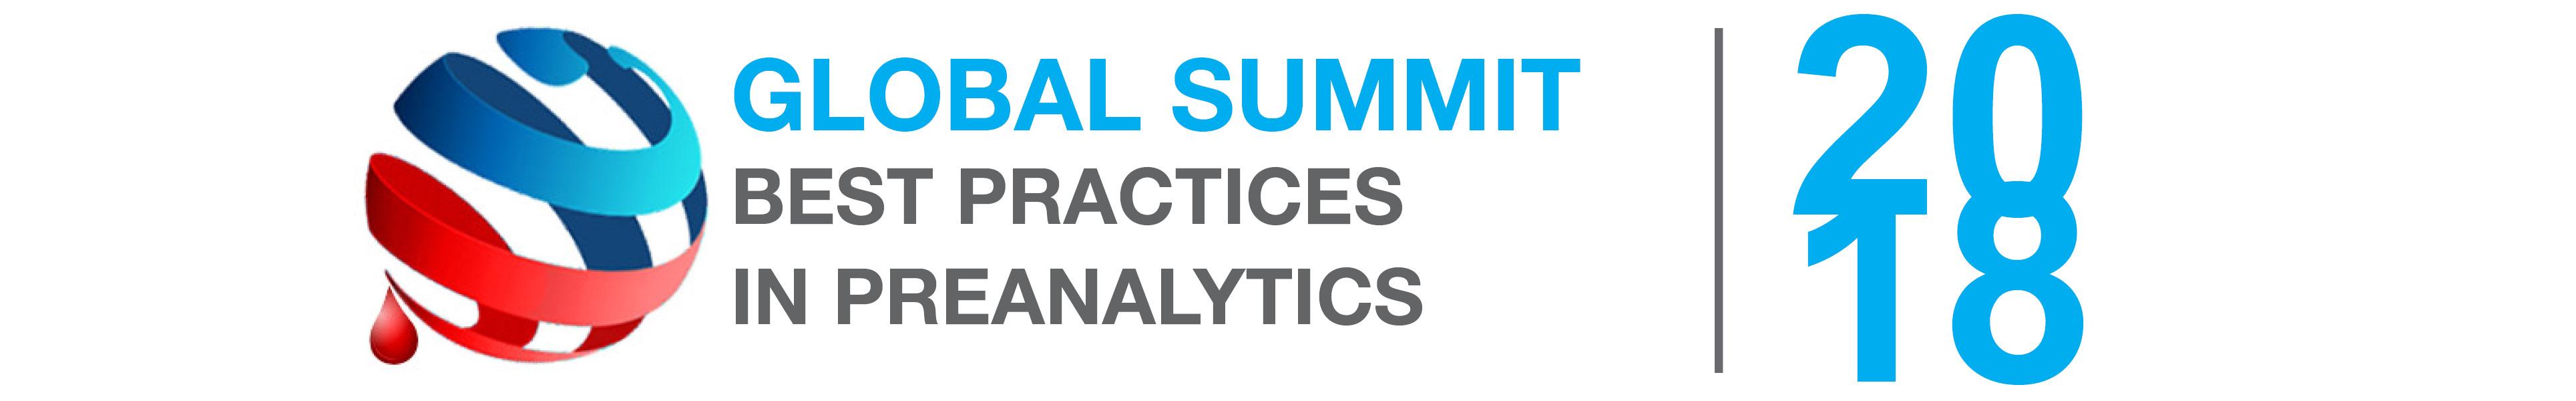 Global Summit on Best Practices in Preanalytics